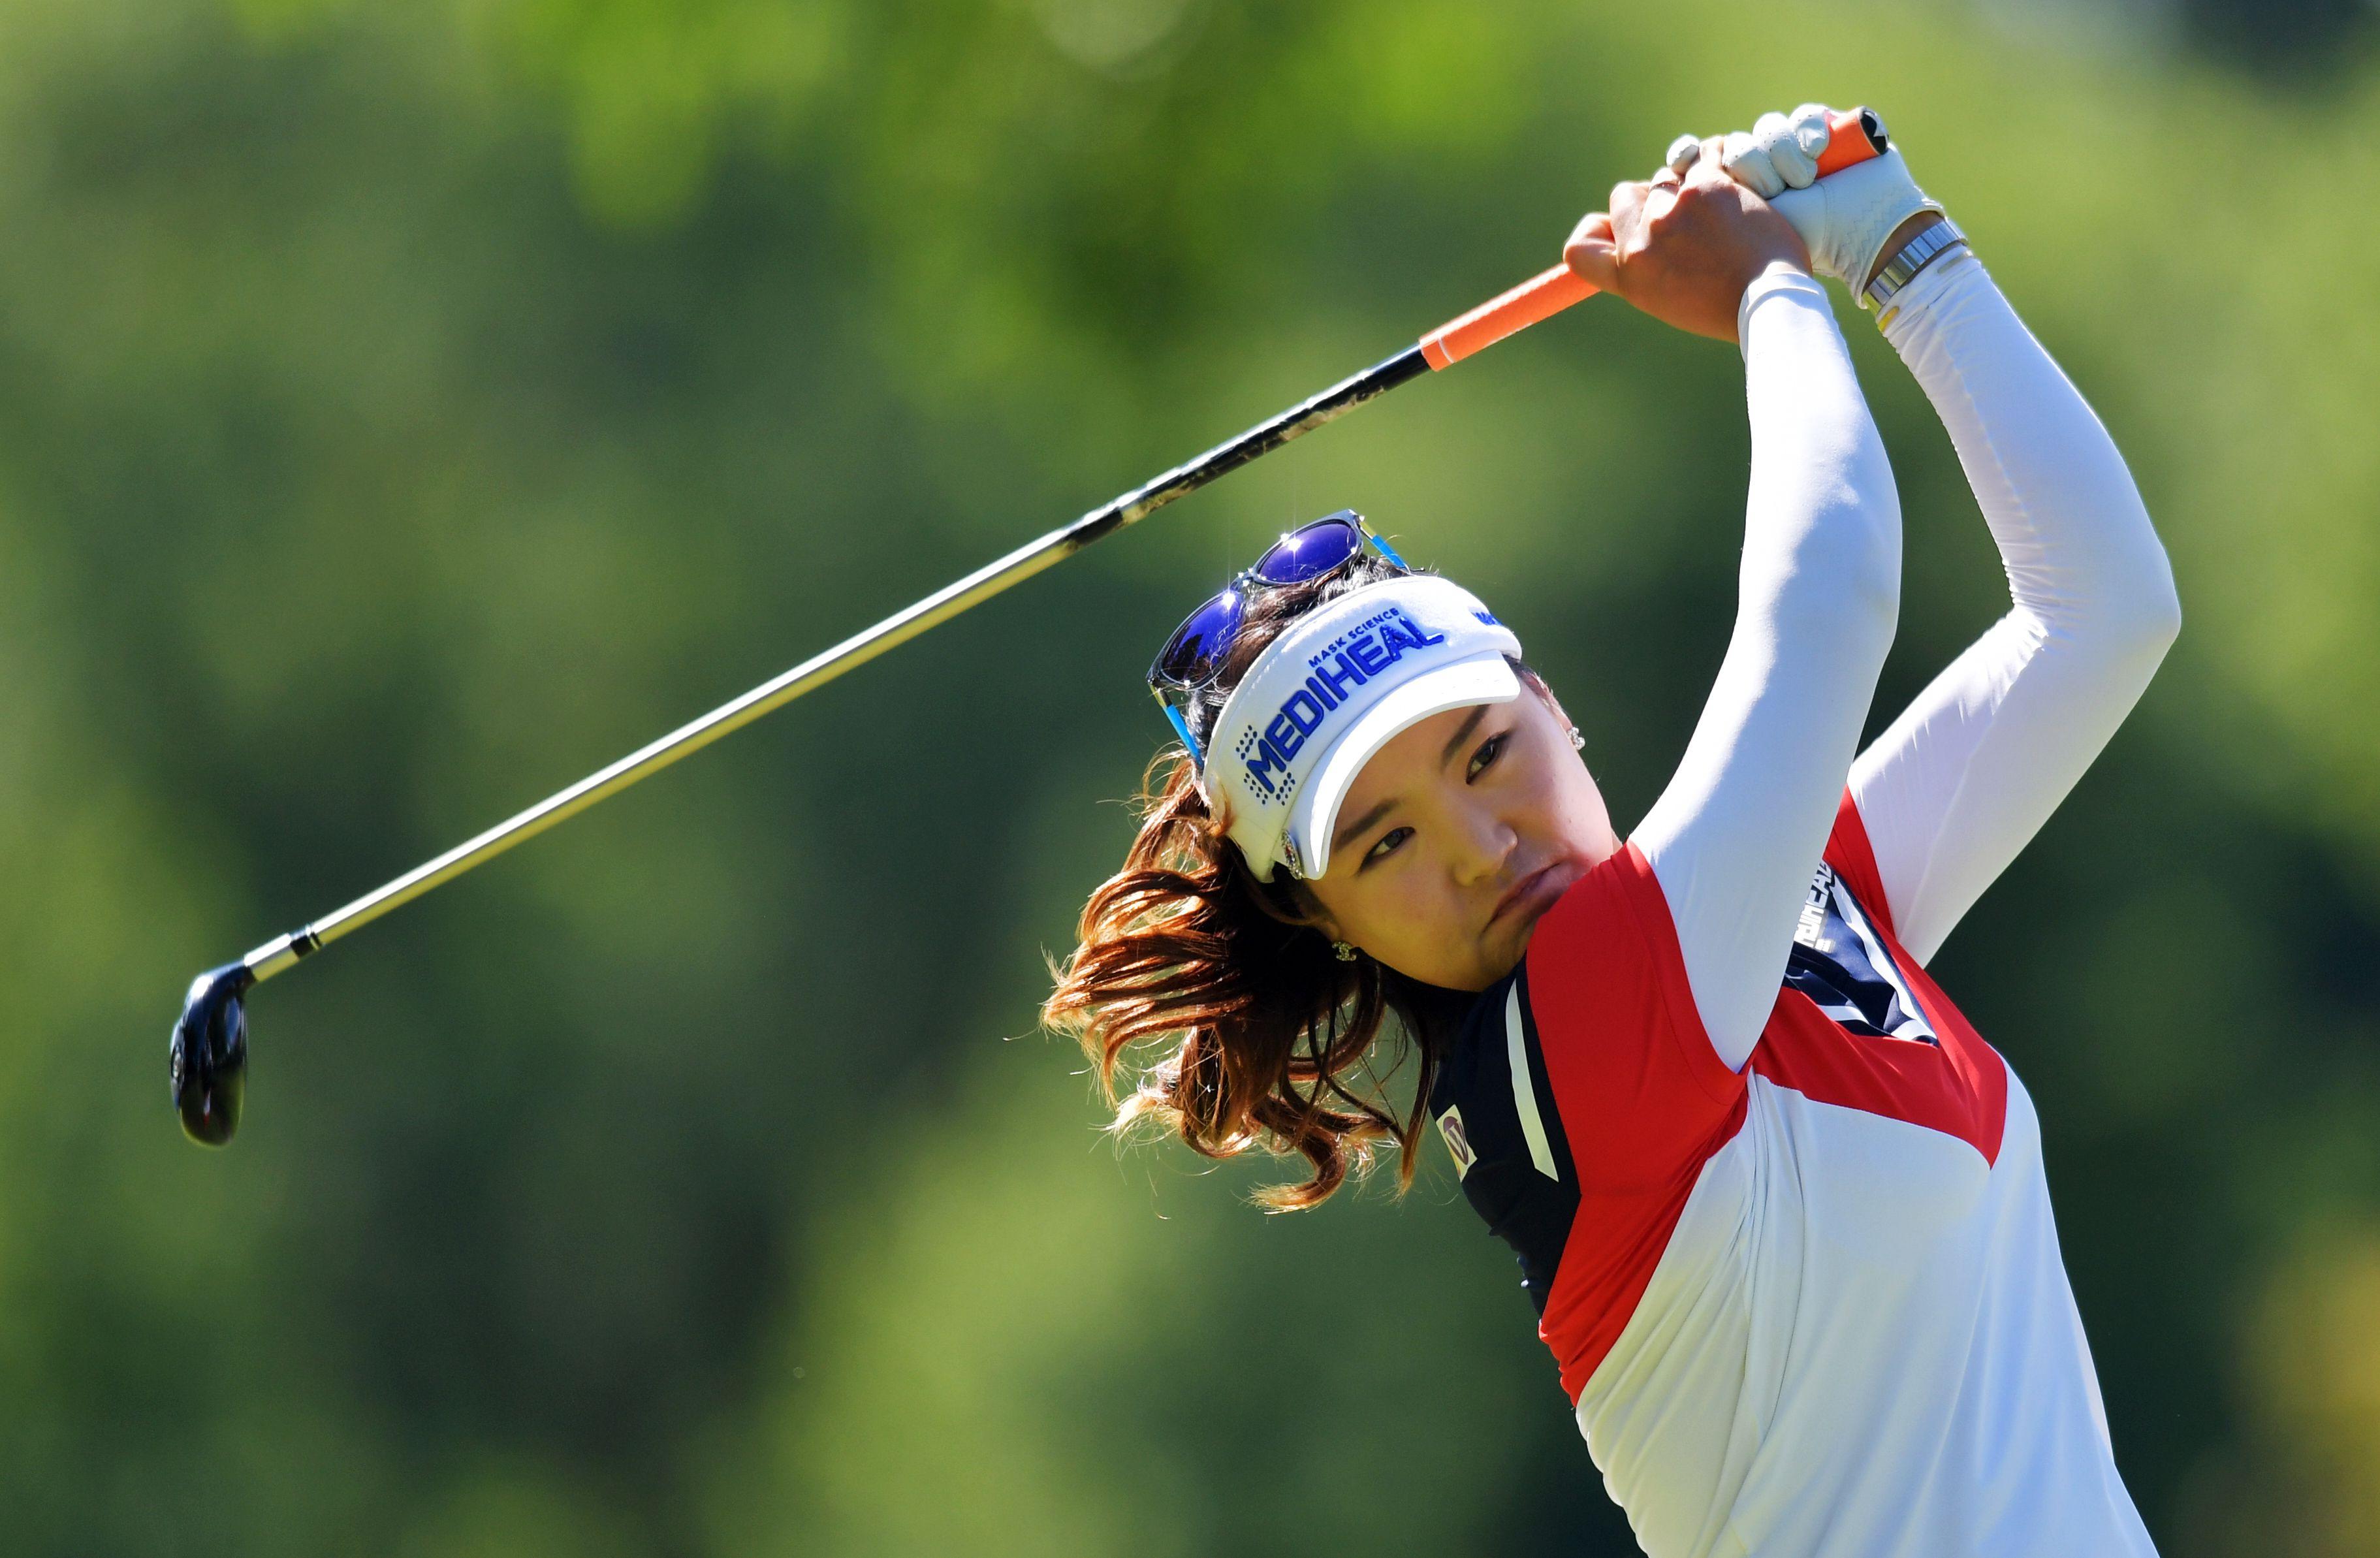 LPGA golfer Michelle McGann uses platform to inspire